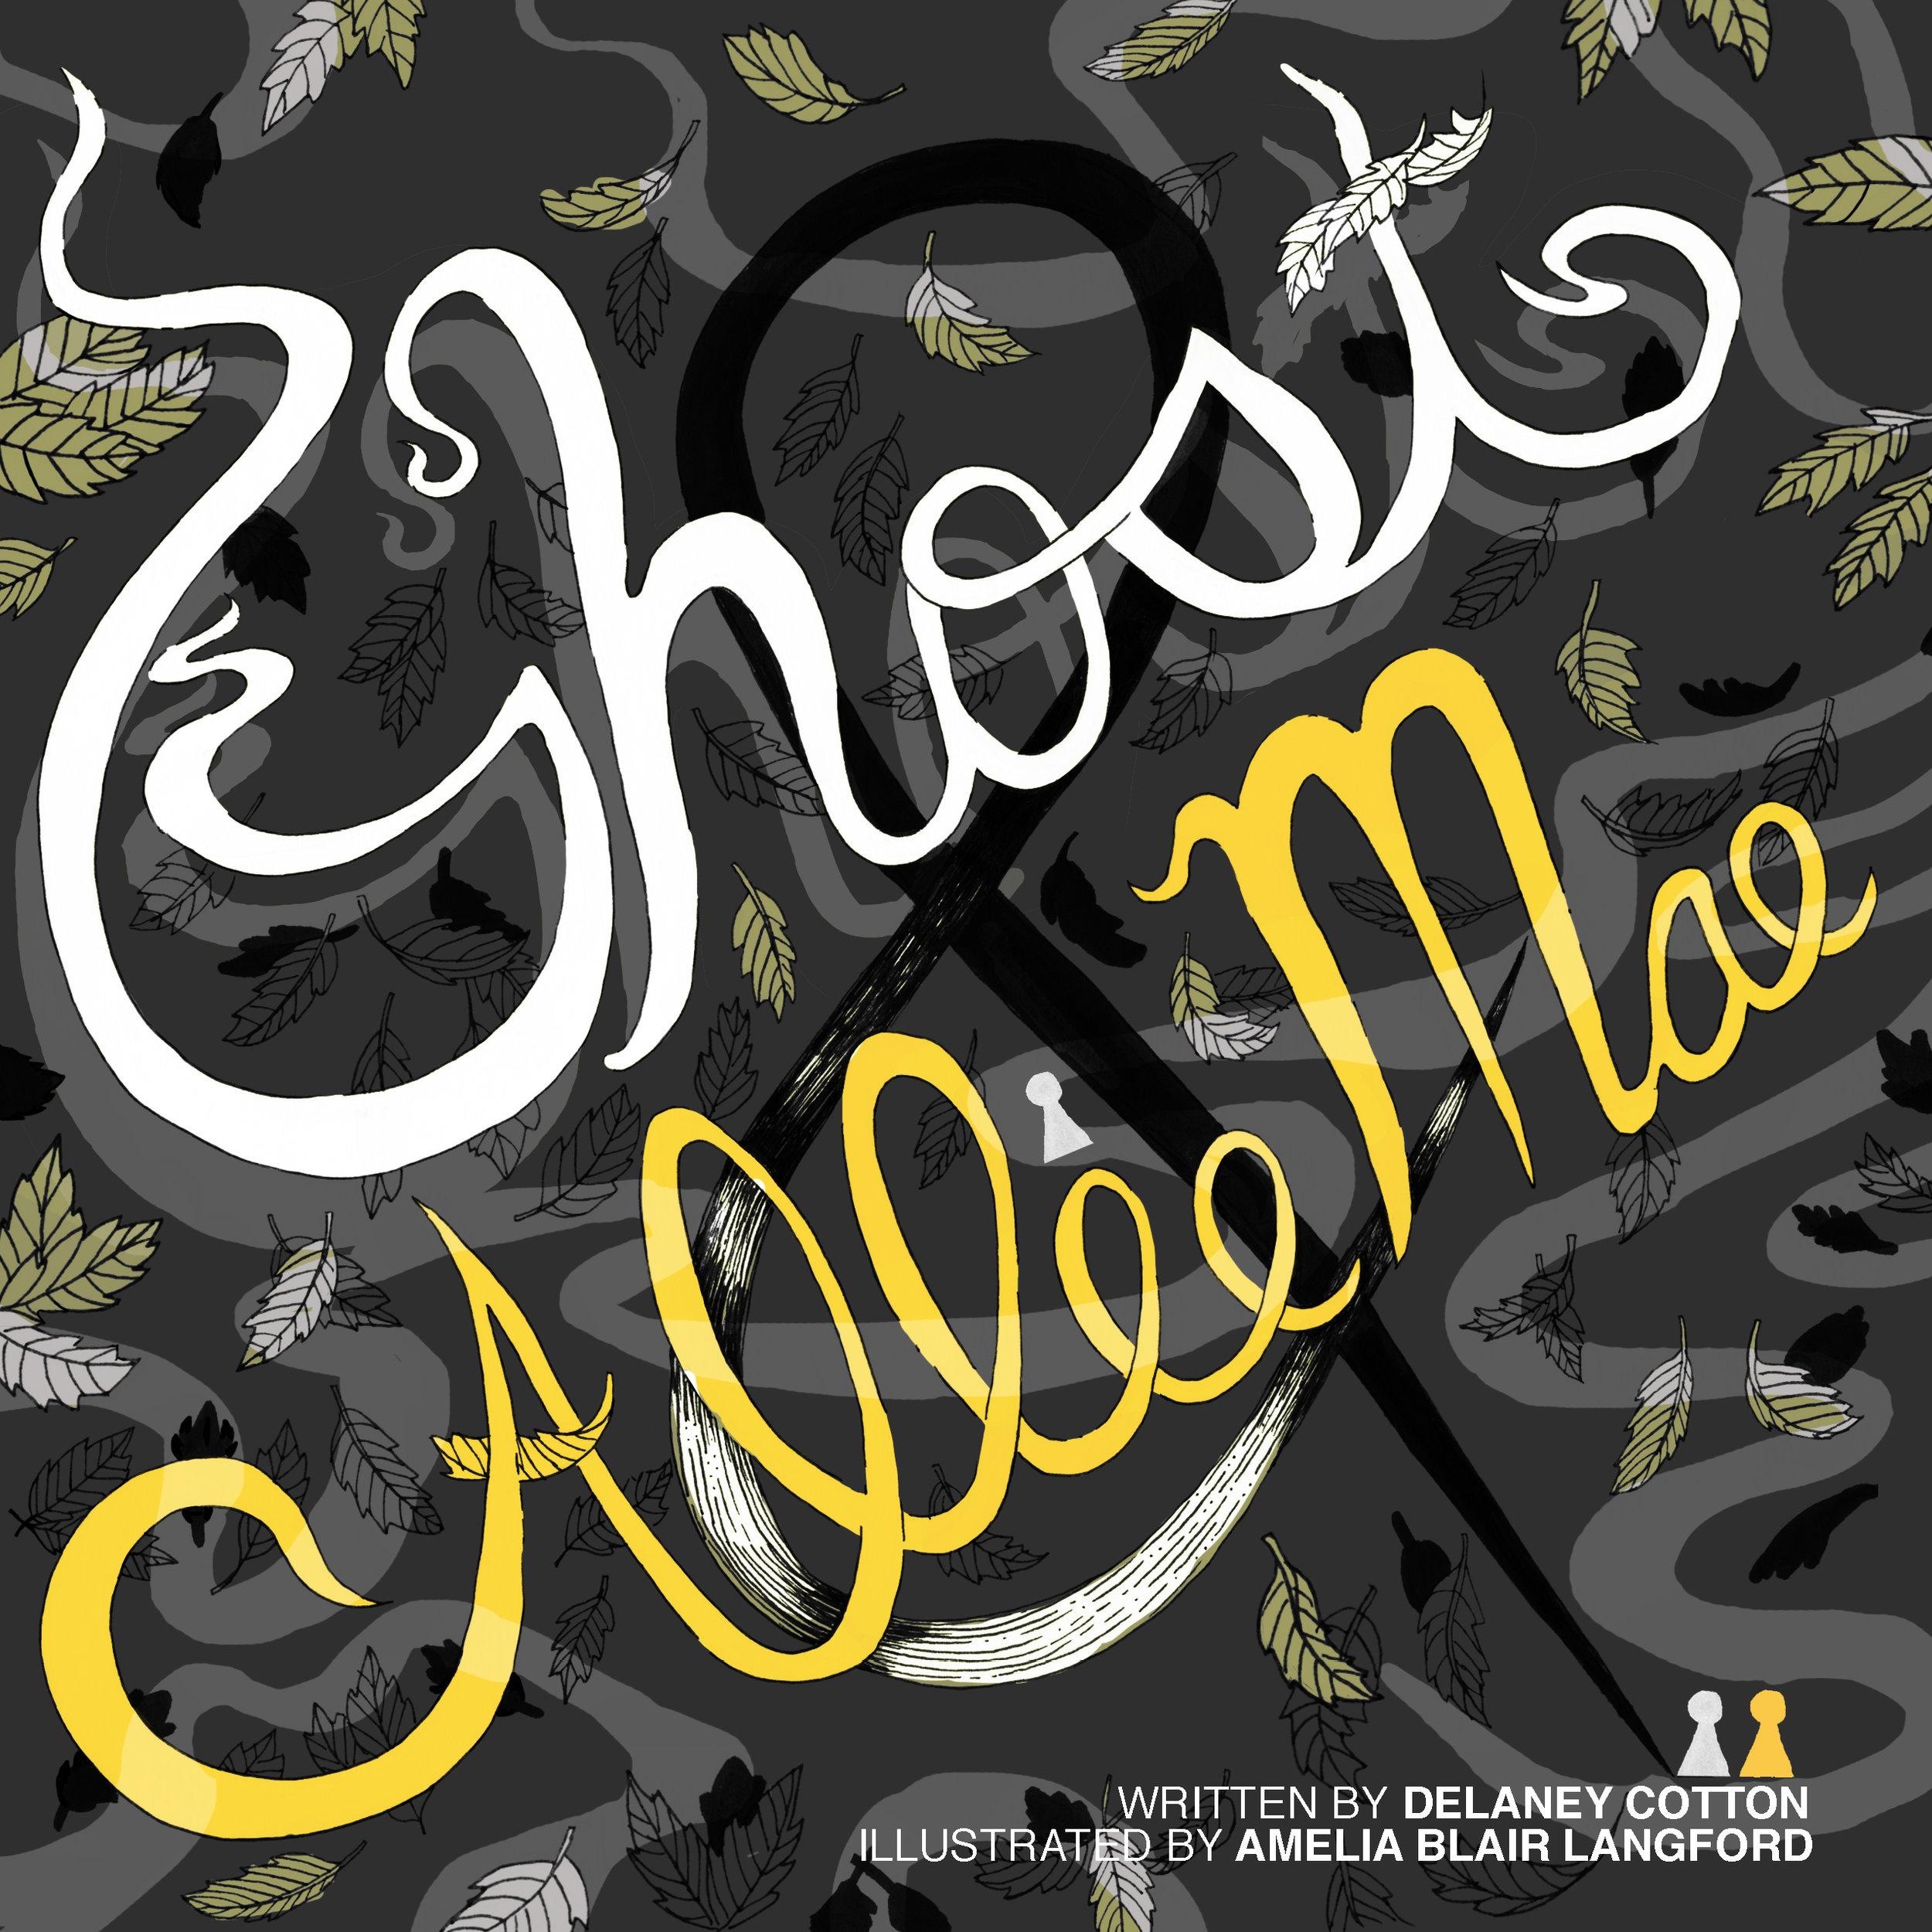 Ghost & Allie Mae / Delaney Cotton & Amelia Blair Langford